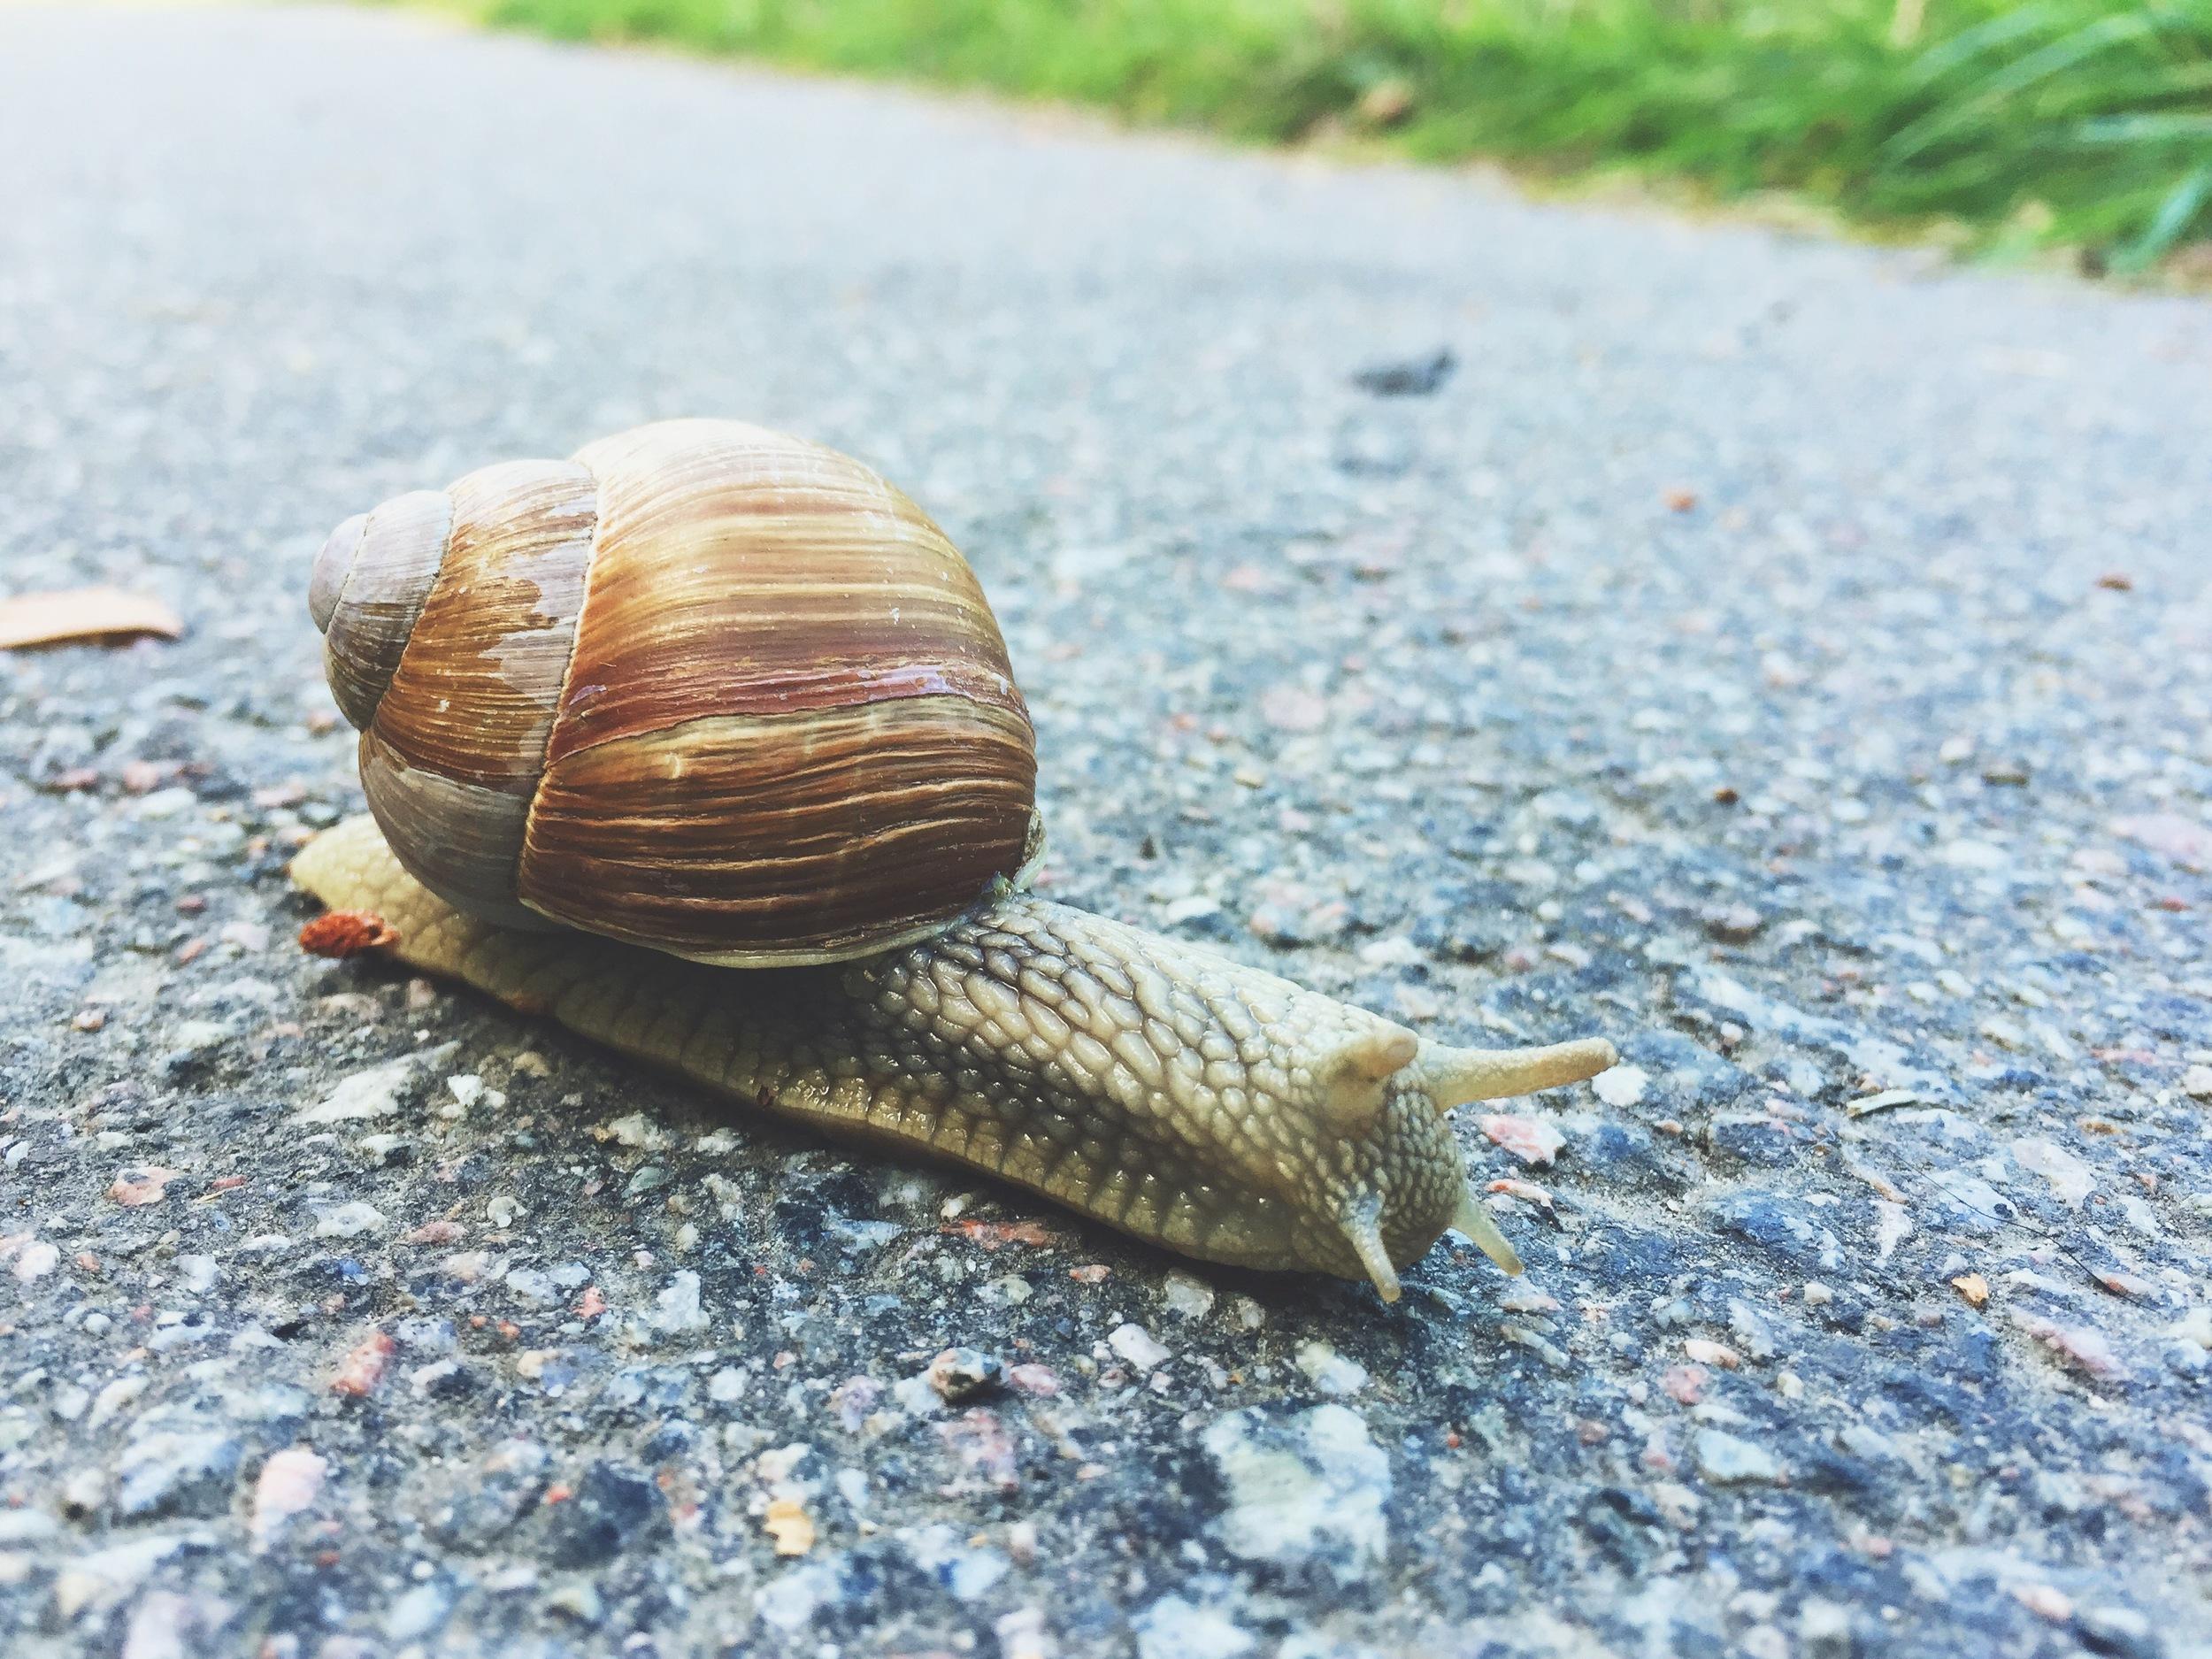 Just another slug photo.